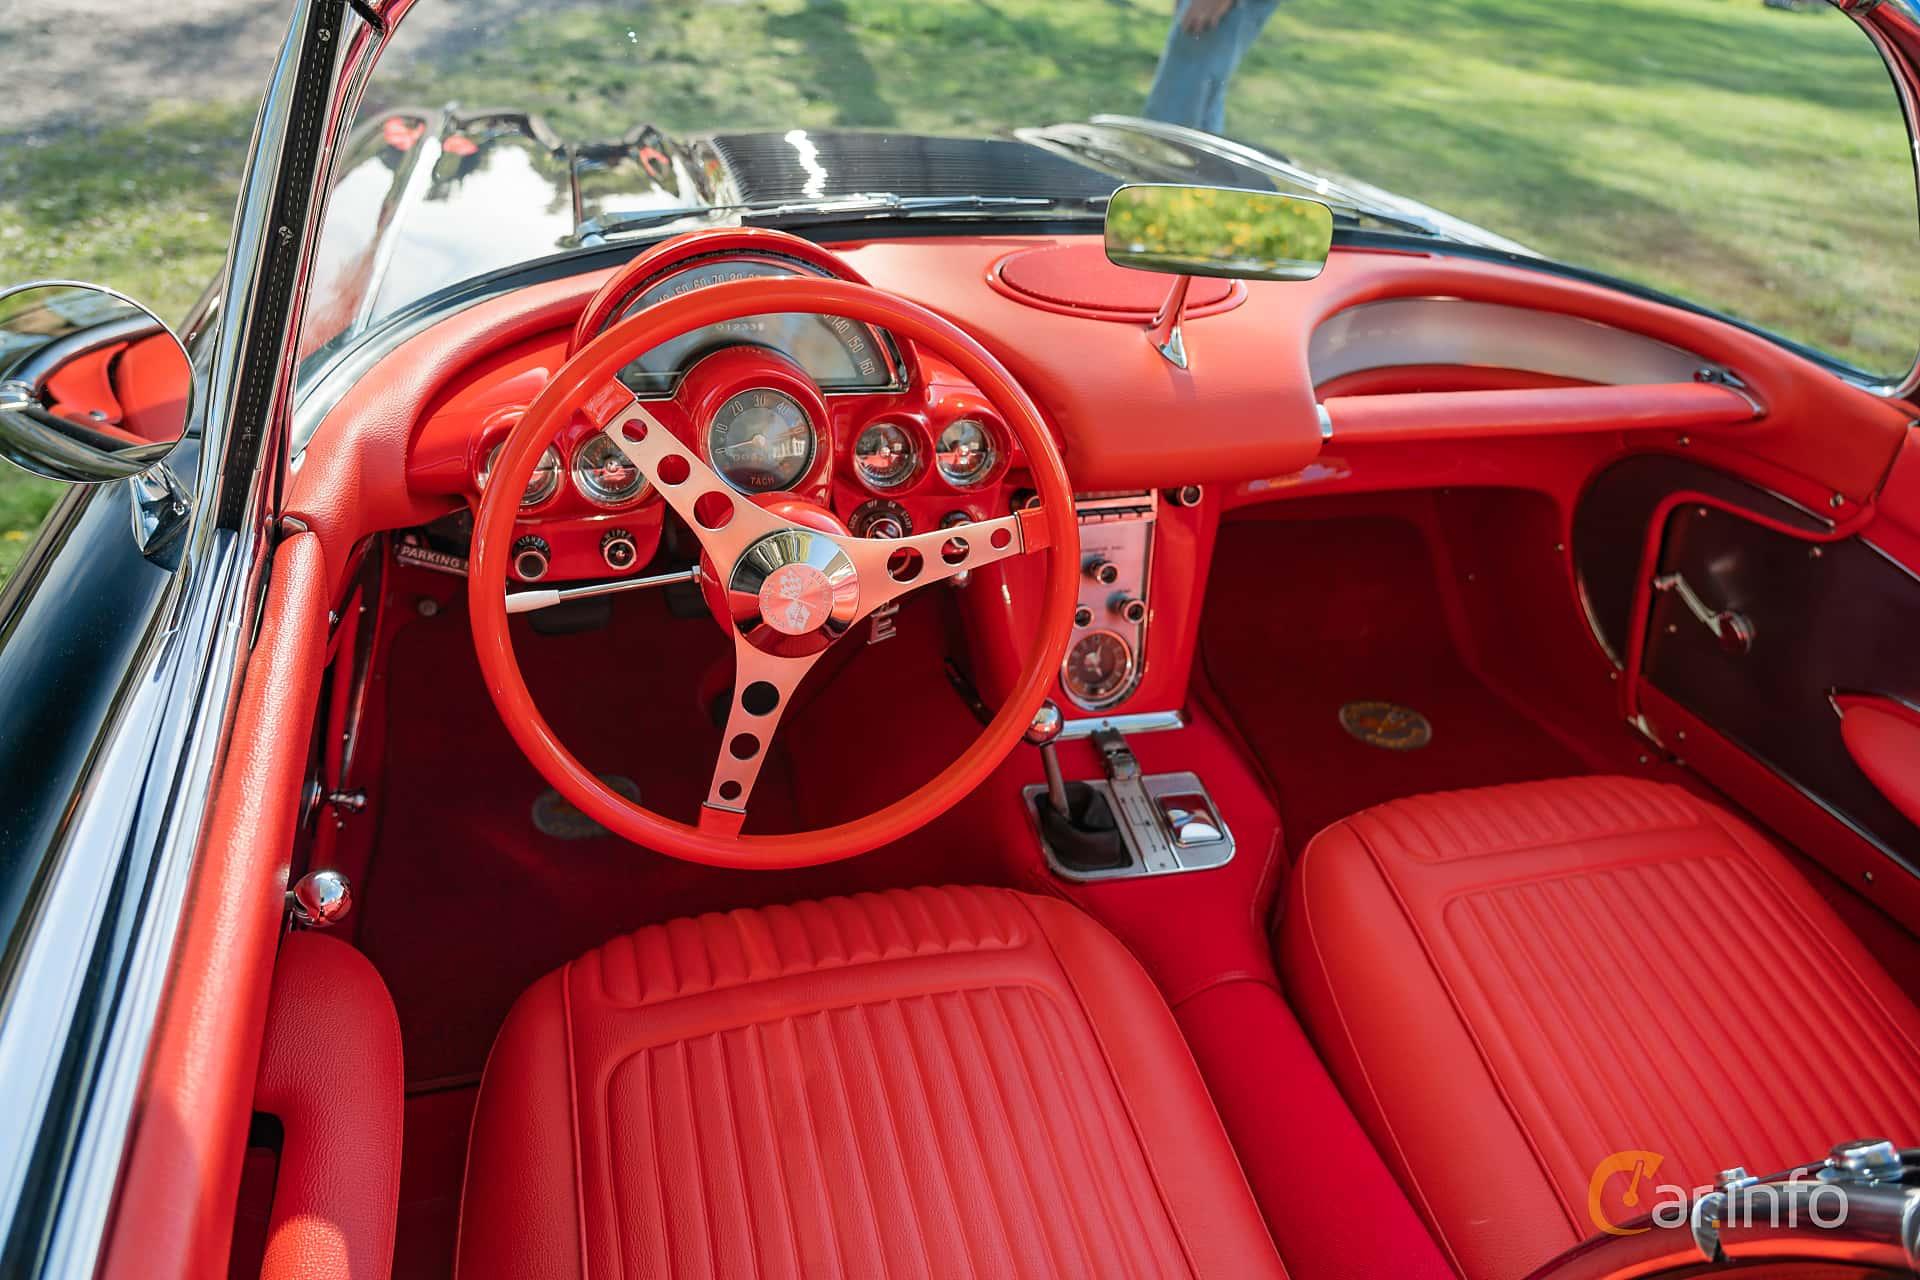 Interior of Chevrolet Corvette 4.6 V8 Manual, 270ps, 1958 at Lissma Classic Car 2019 vecka 20